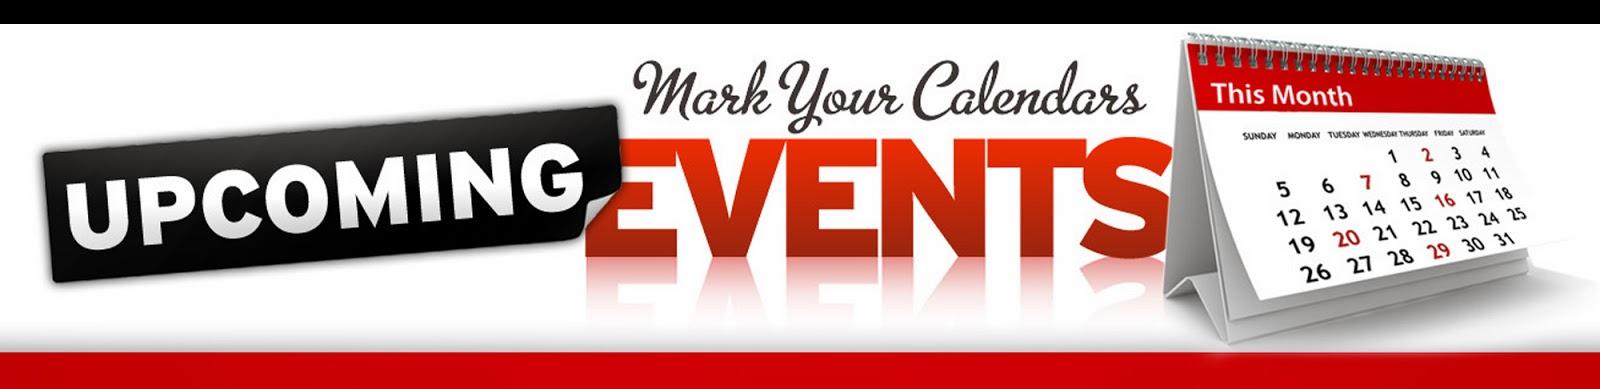 Image result for mark your calendar image